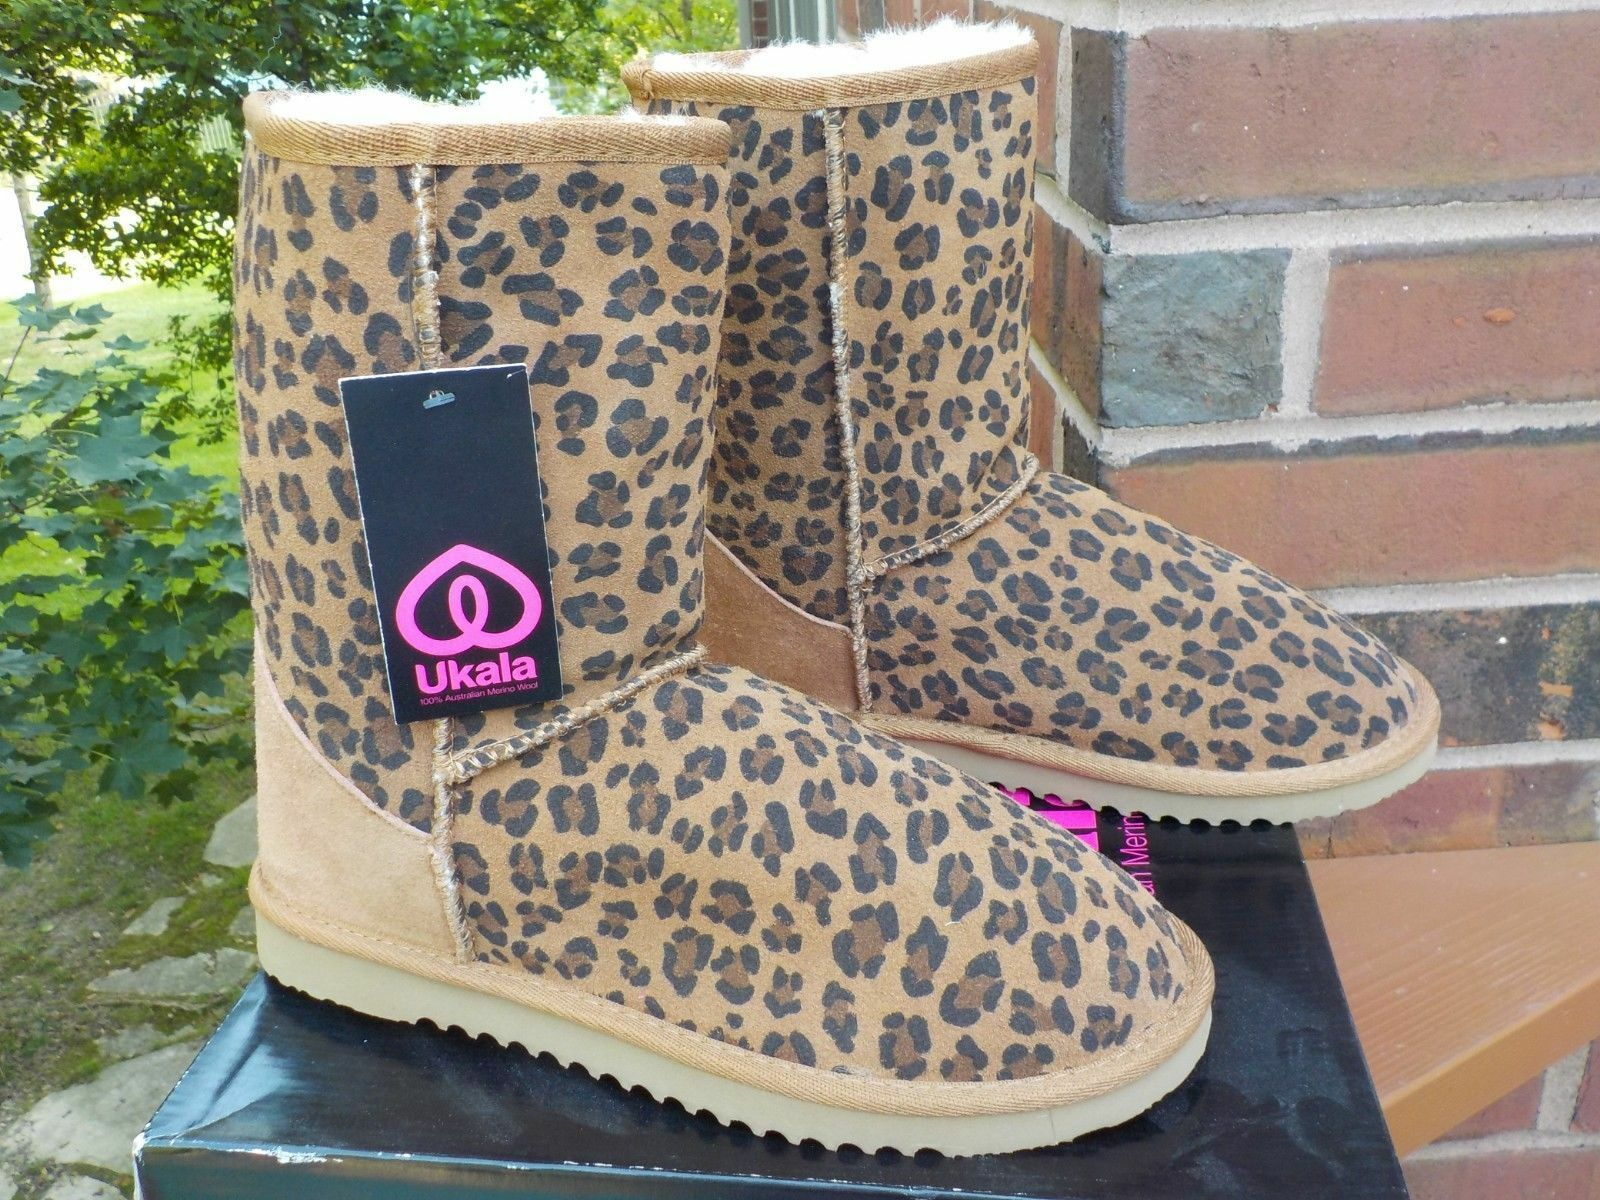 NIB Ukala Ally Leopard Print Chesnut Suede Wool Stiefel Lined Short Stiefel Wool damen Größe 9 52c4e1